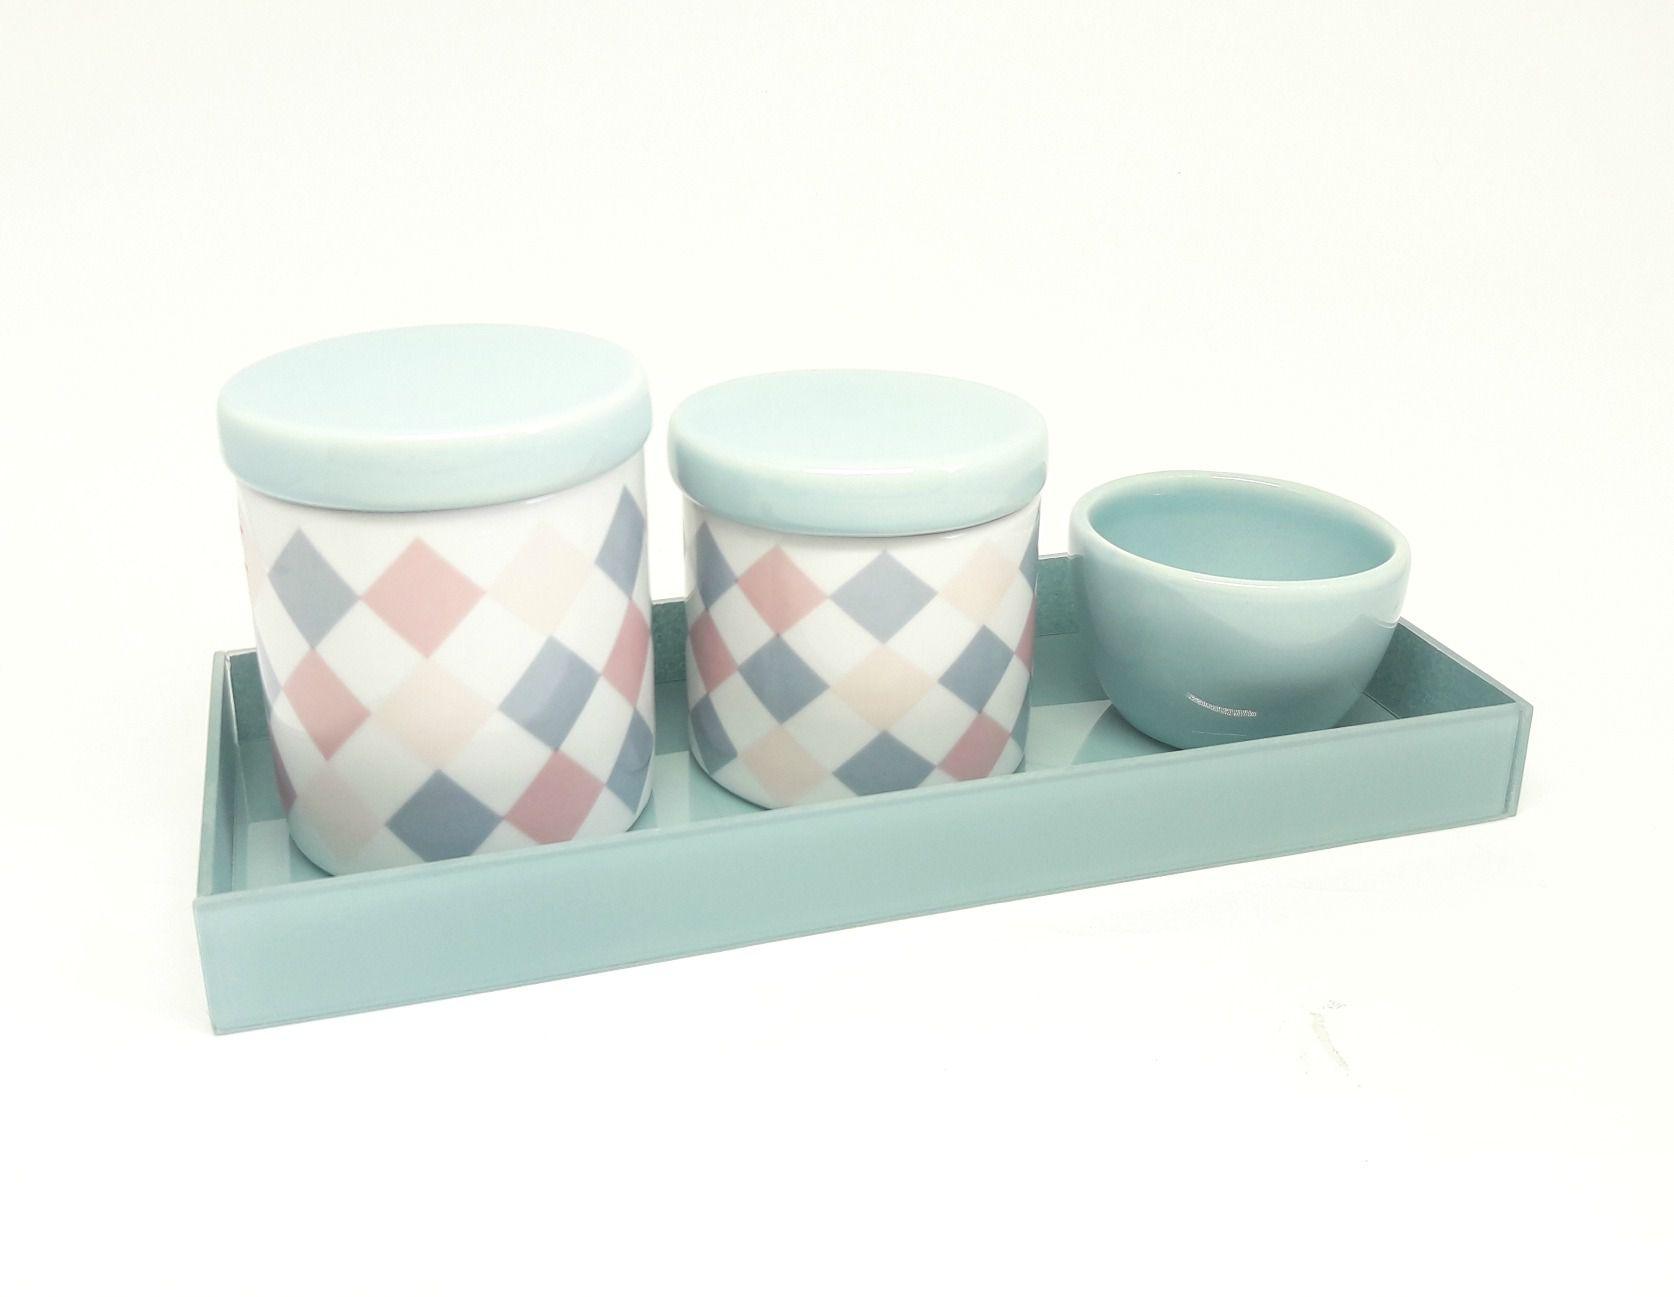 Kit Higiene Bebê Porcelana | Losangos coloridos  com Bandeja de Vidro